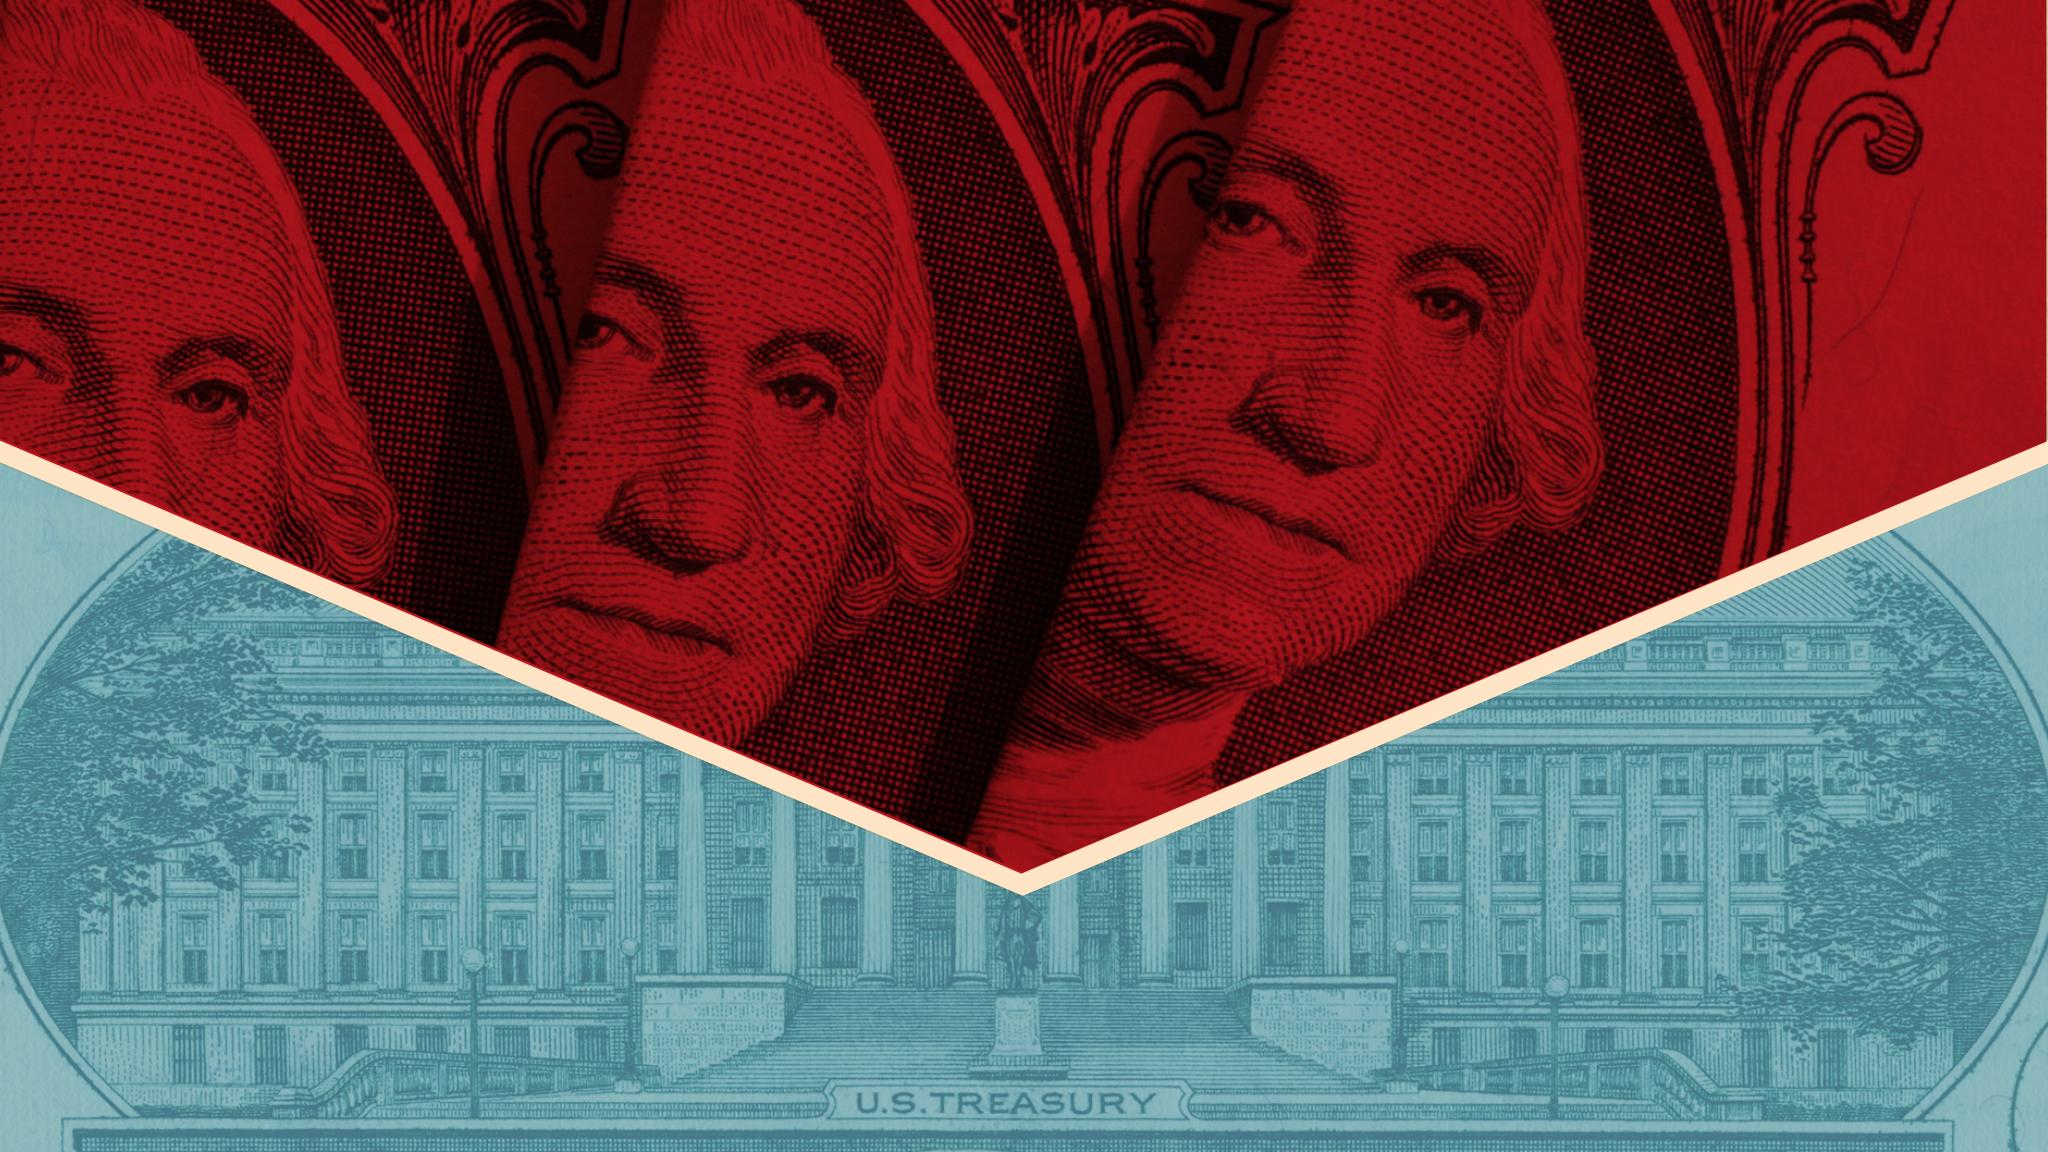 Sliding US dollar creates a trap for investors